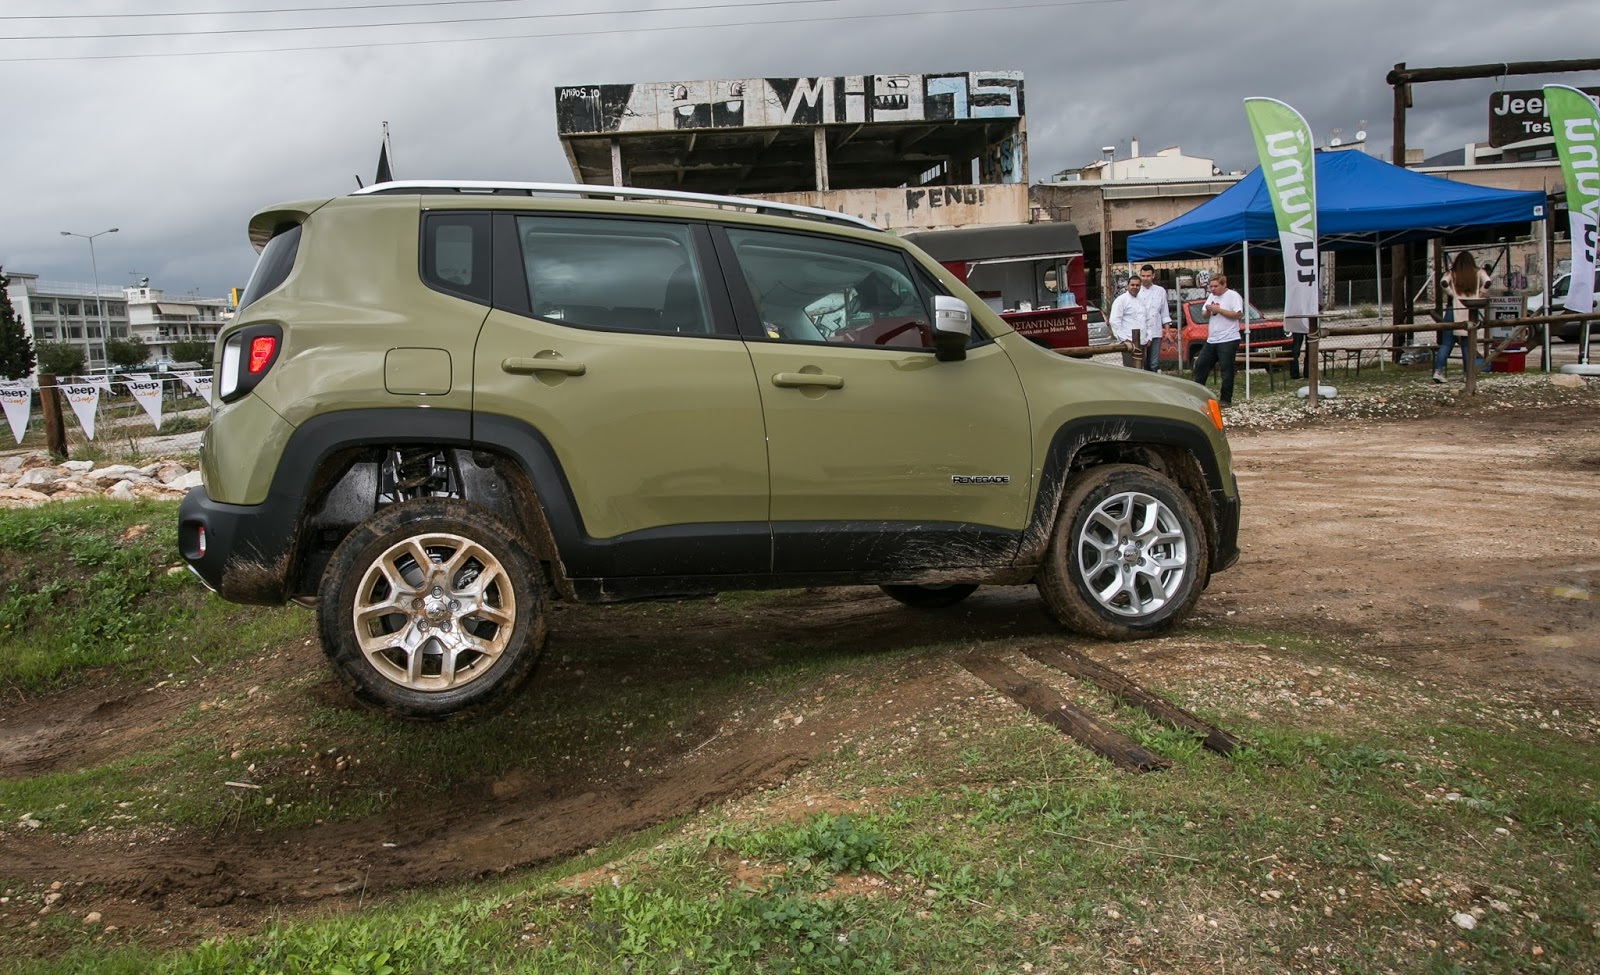 JEEP%2BCAMP GK 0427 Πετάμε ένα Jeep Renegade σε λάσπες, πέτρες, άμμο, λίμνες. Θα τα καταφέρει; Jeep, Jeep Renegade, Renegade, SUV, TEST, zblog, ΔΟΚΙΜΕΣ